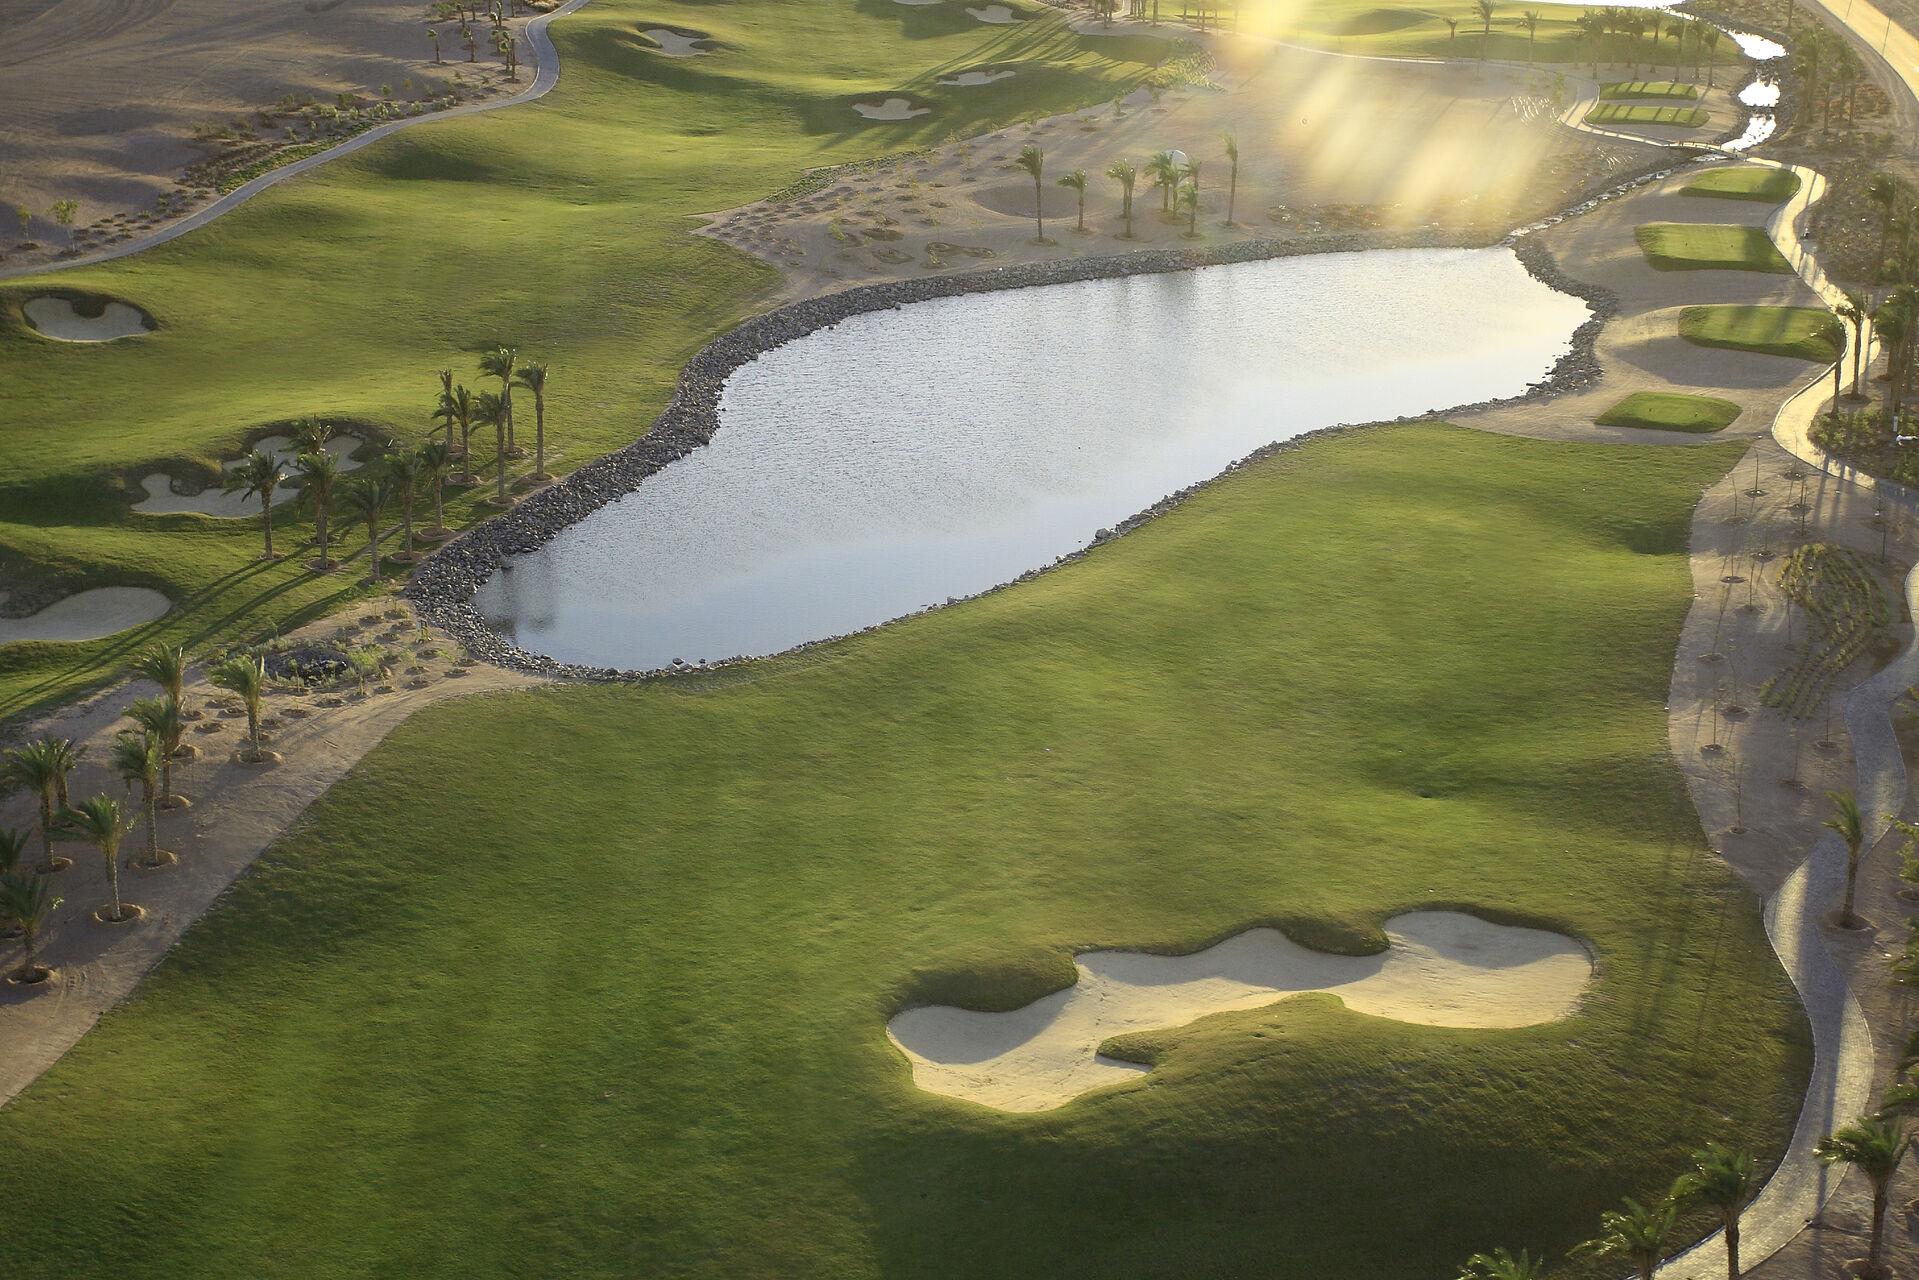 https://cms.satur.sk/data/imgs/tour_image/orig/golf-court-1-1947531.jpg